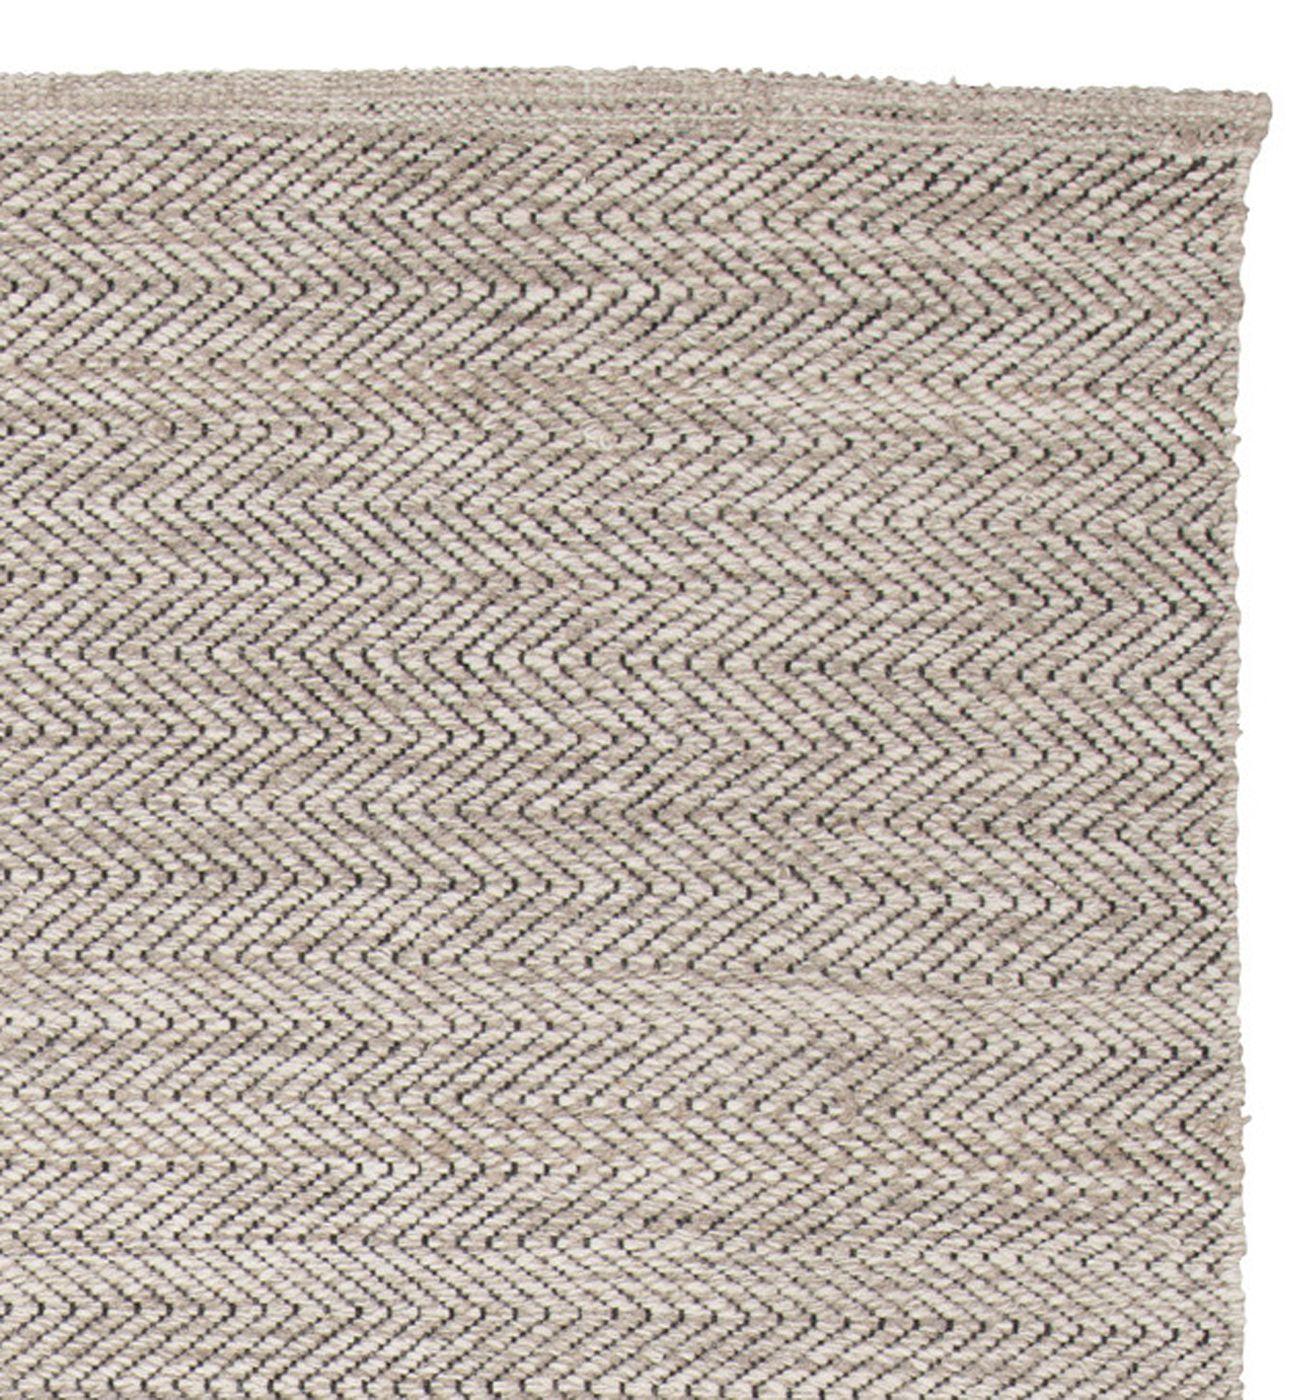 Linie Design Lia Tæppe - anthracit - 170/240